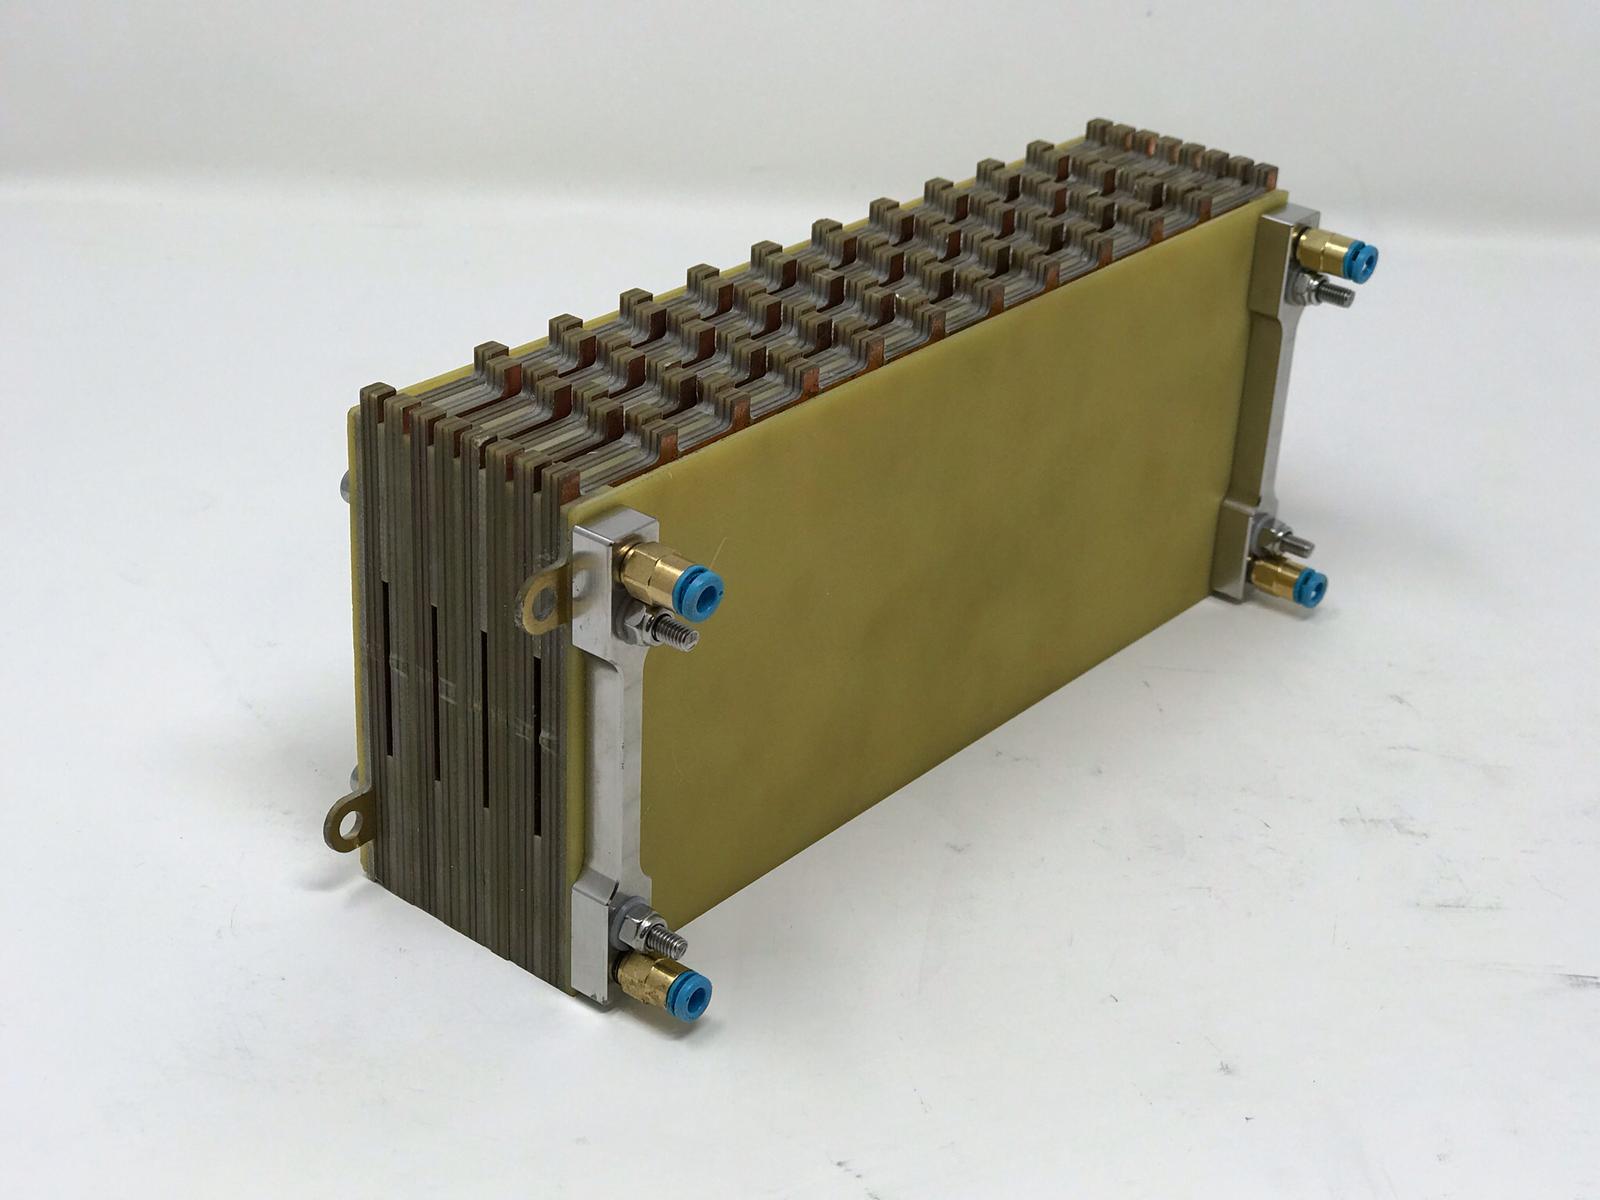 PCBFC fuel cell